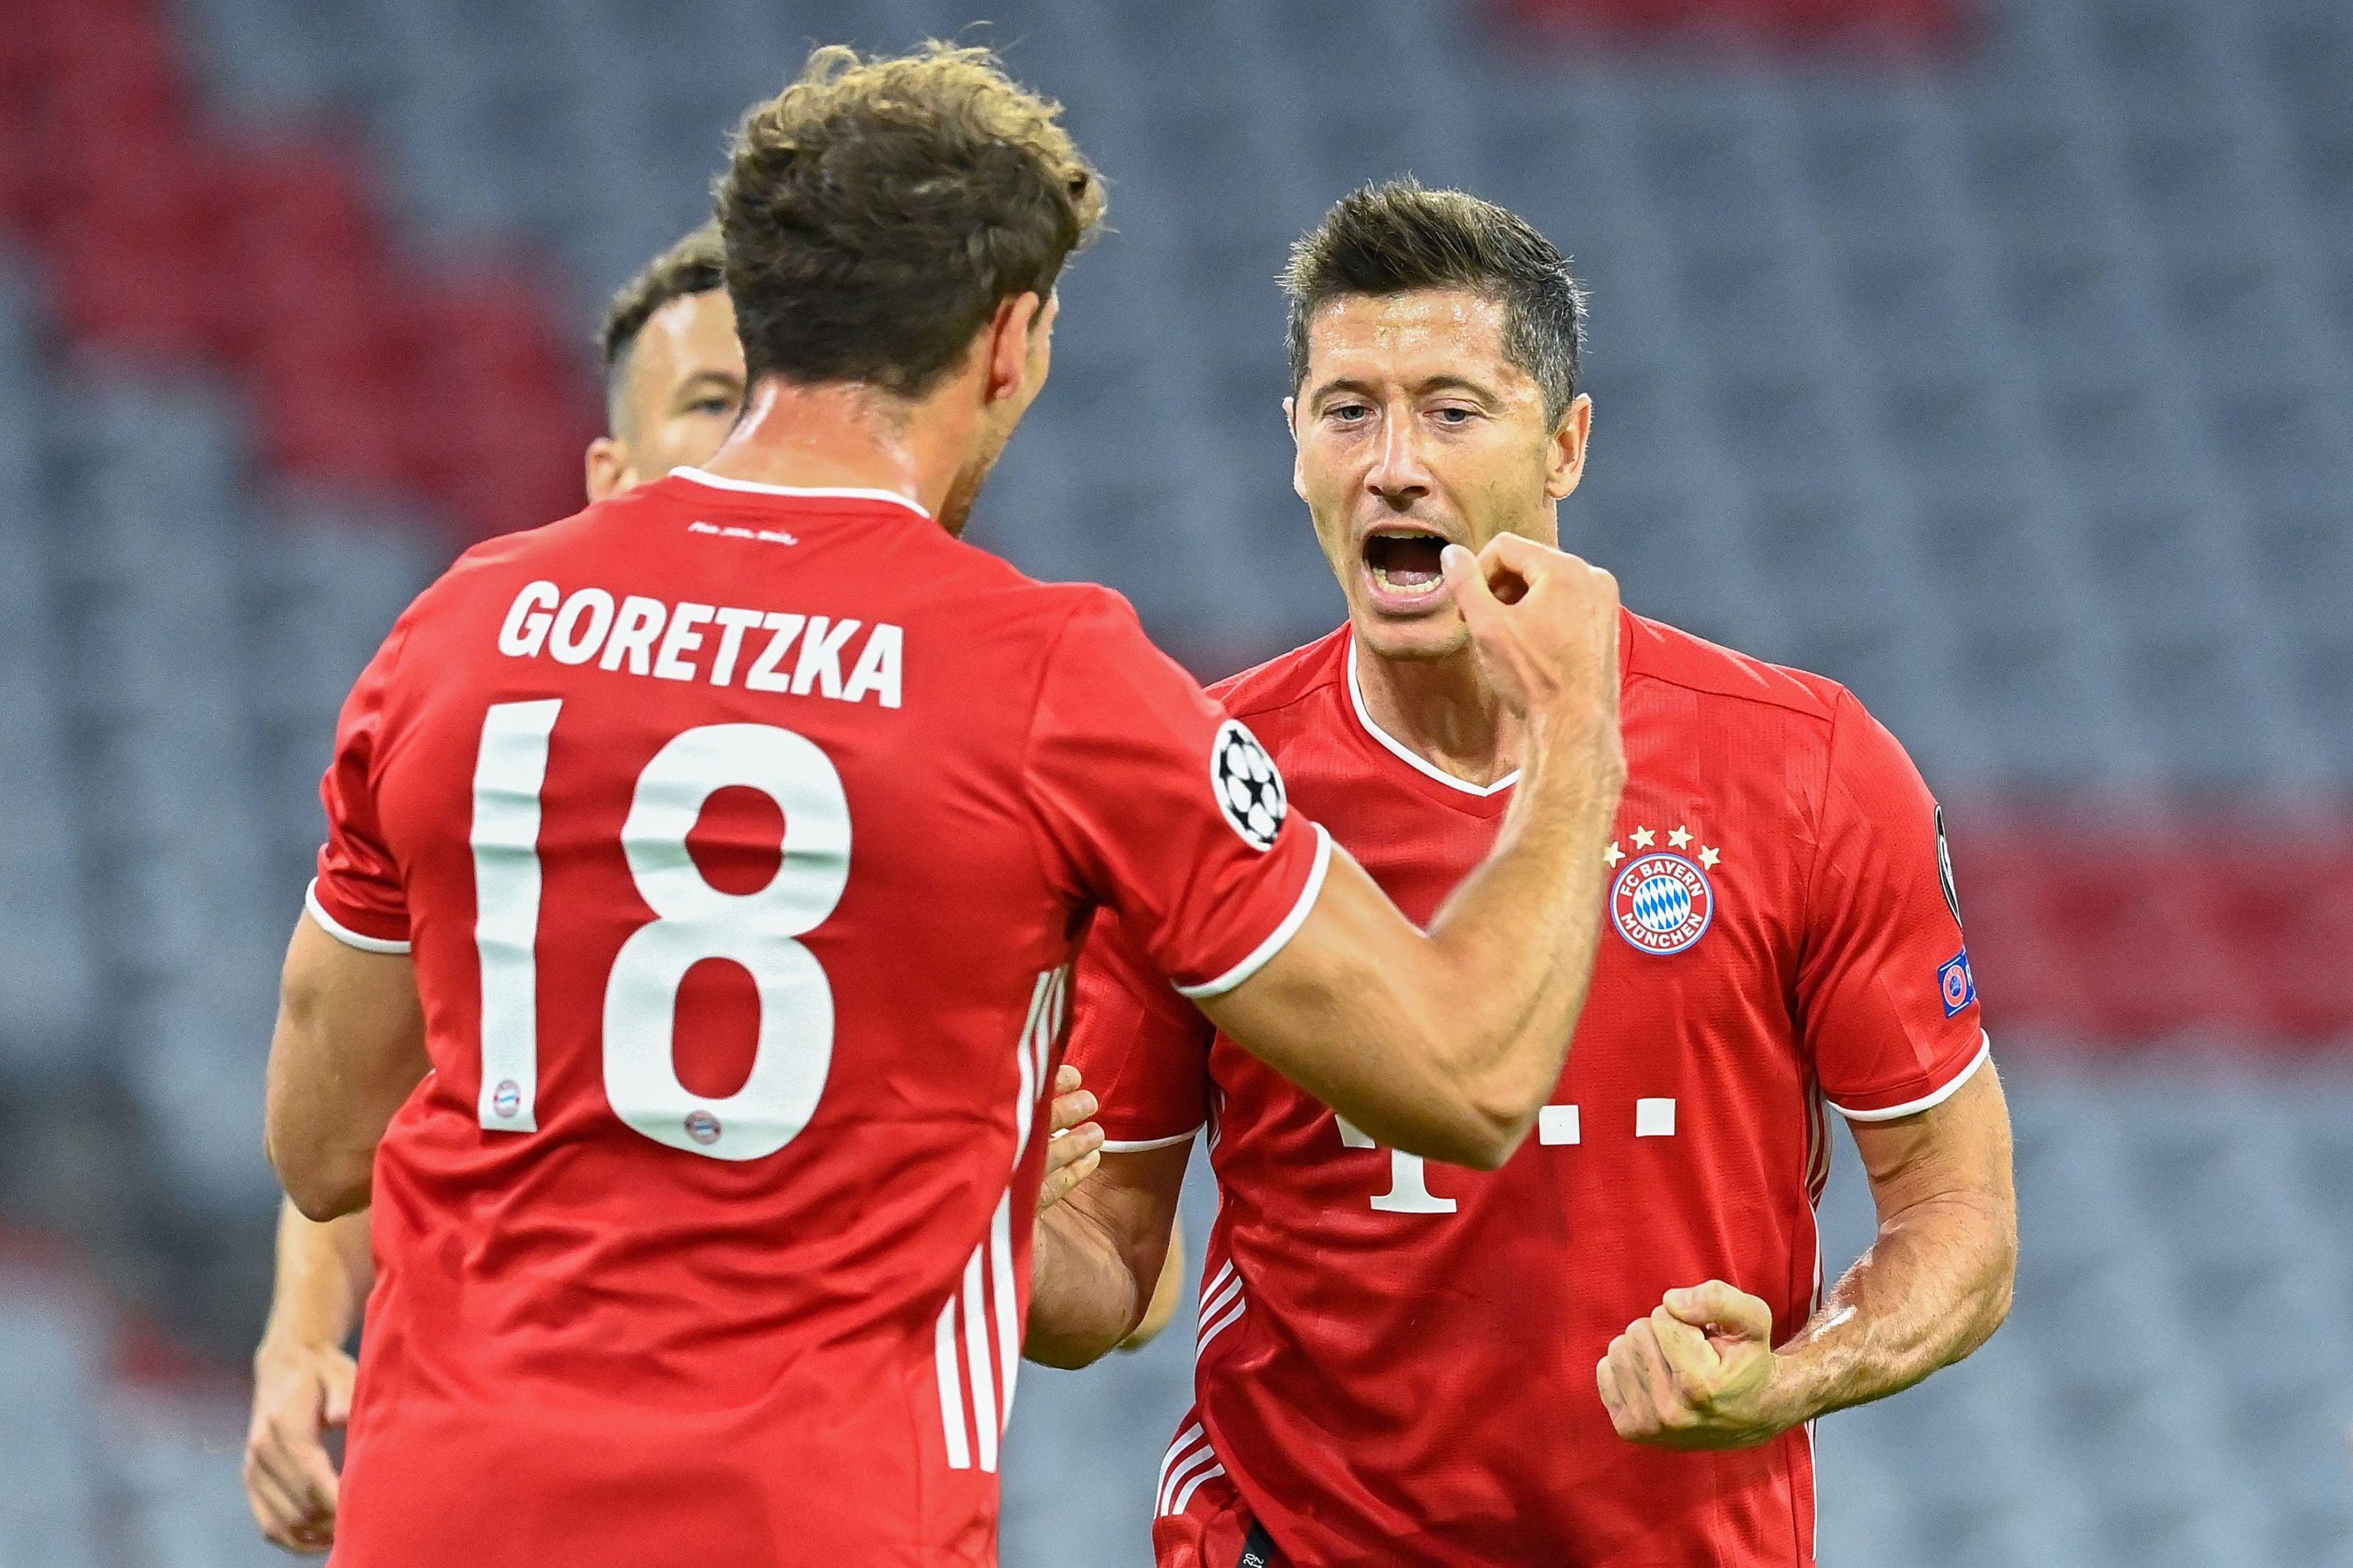 Bayern Munich Vs Lyon Live Stream Watch Champions League Online